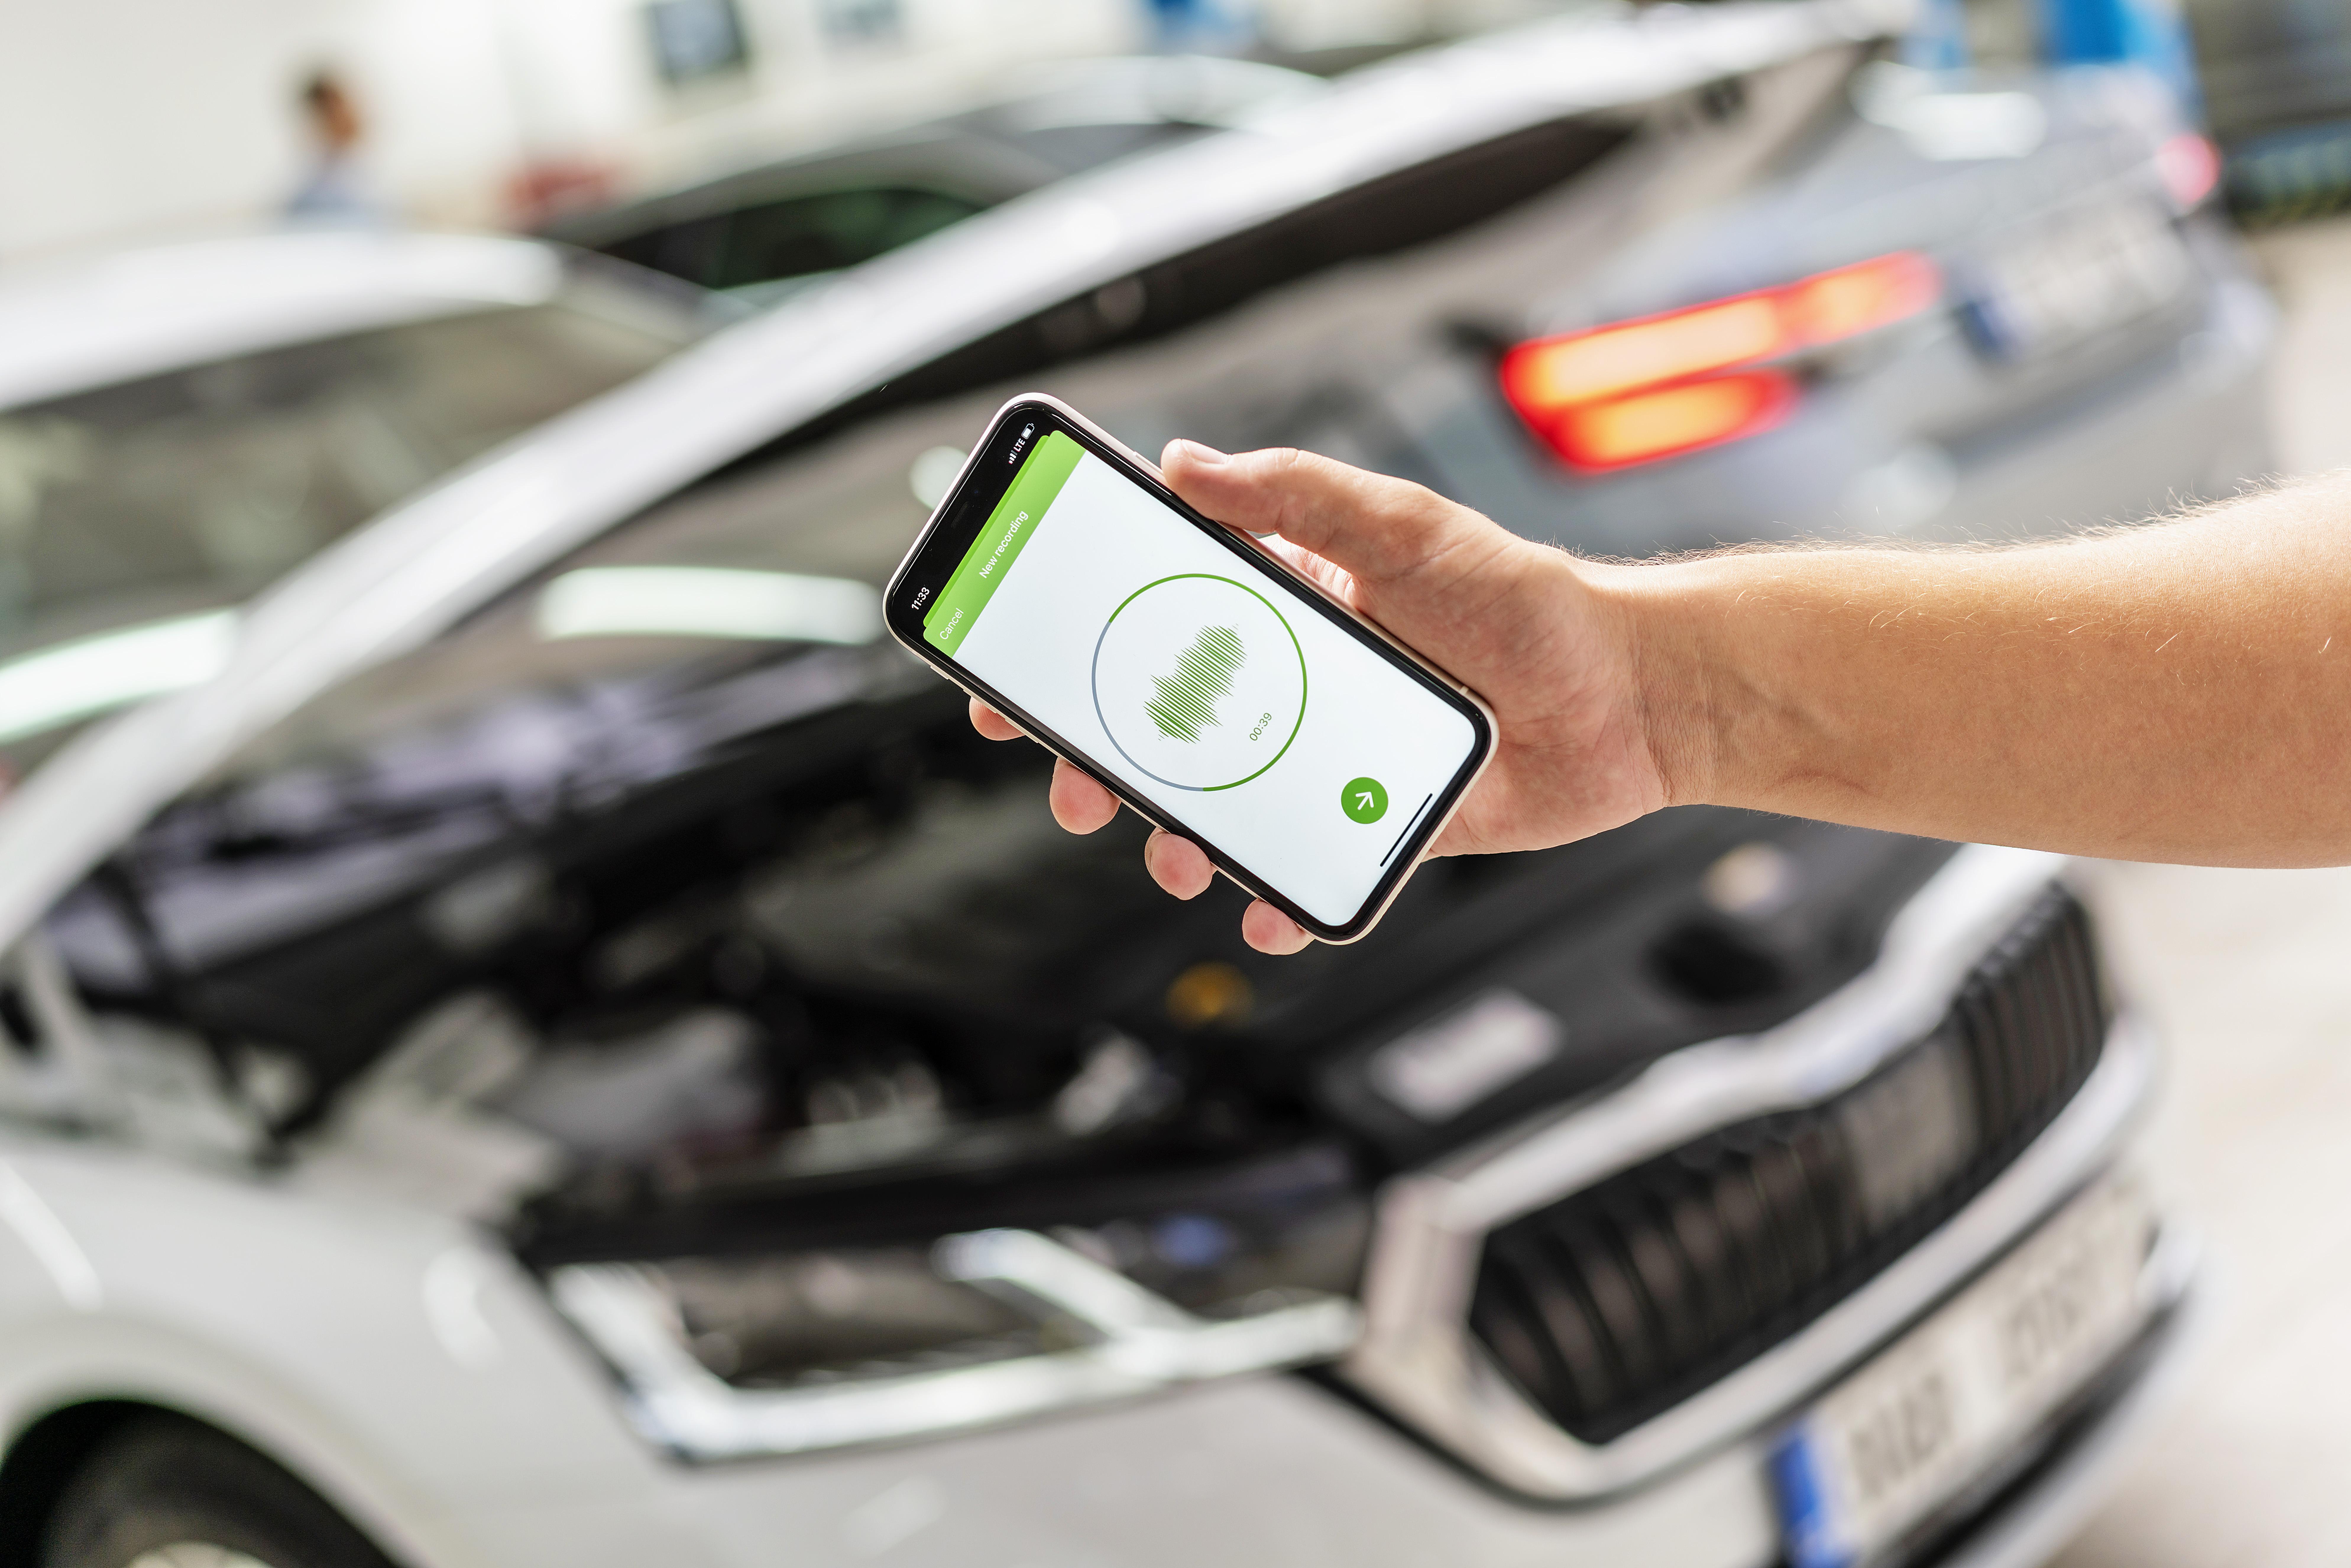 SKODA AUTO uses artificial intelligence for even more accurate car diagnostics - Image 2